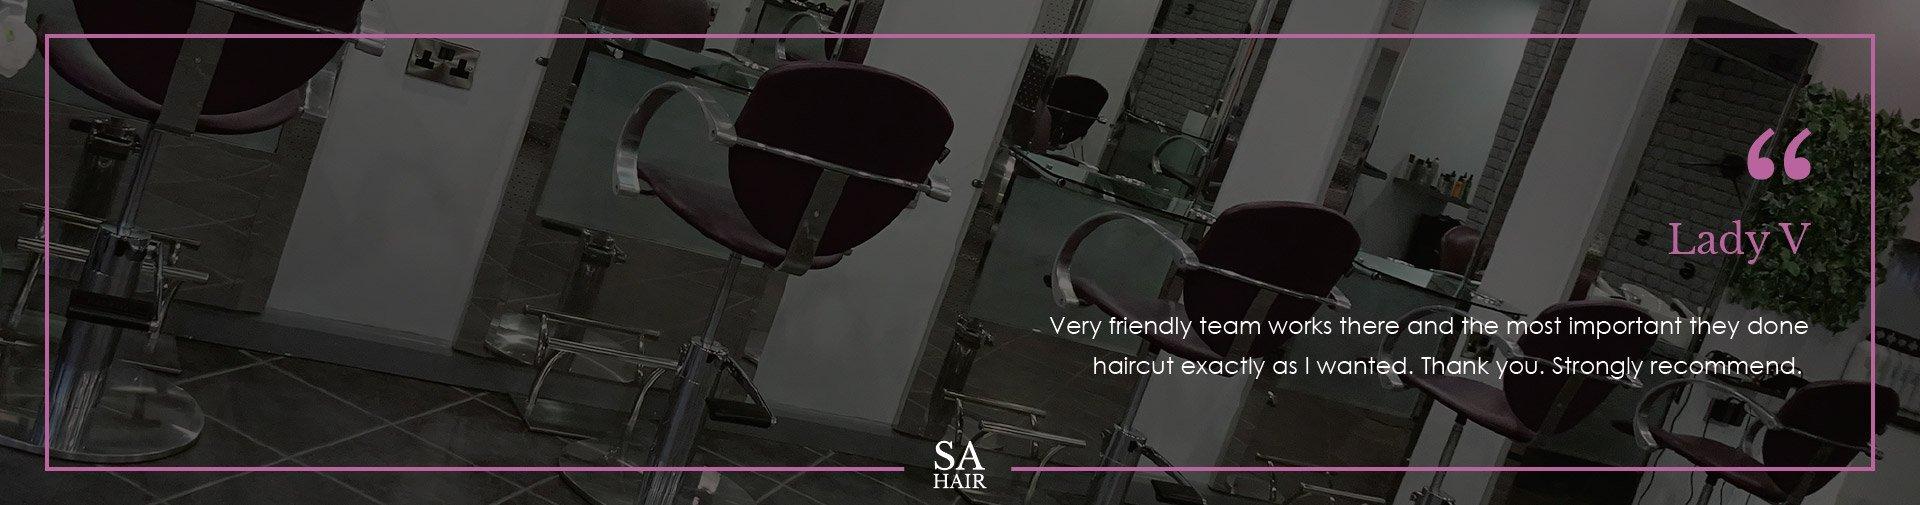 Testimonial Stephen Alexander Hairdressing salon in Chelmsford